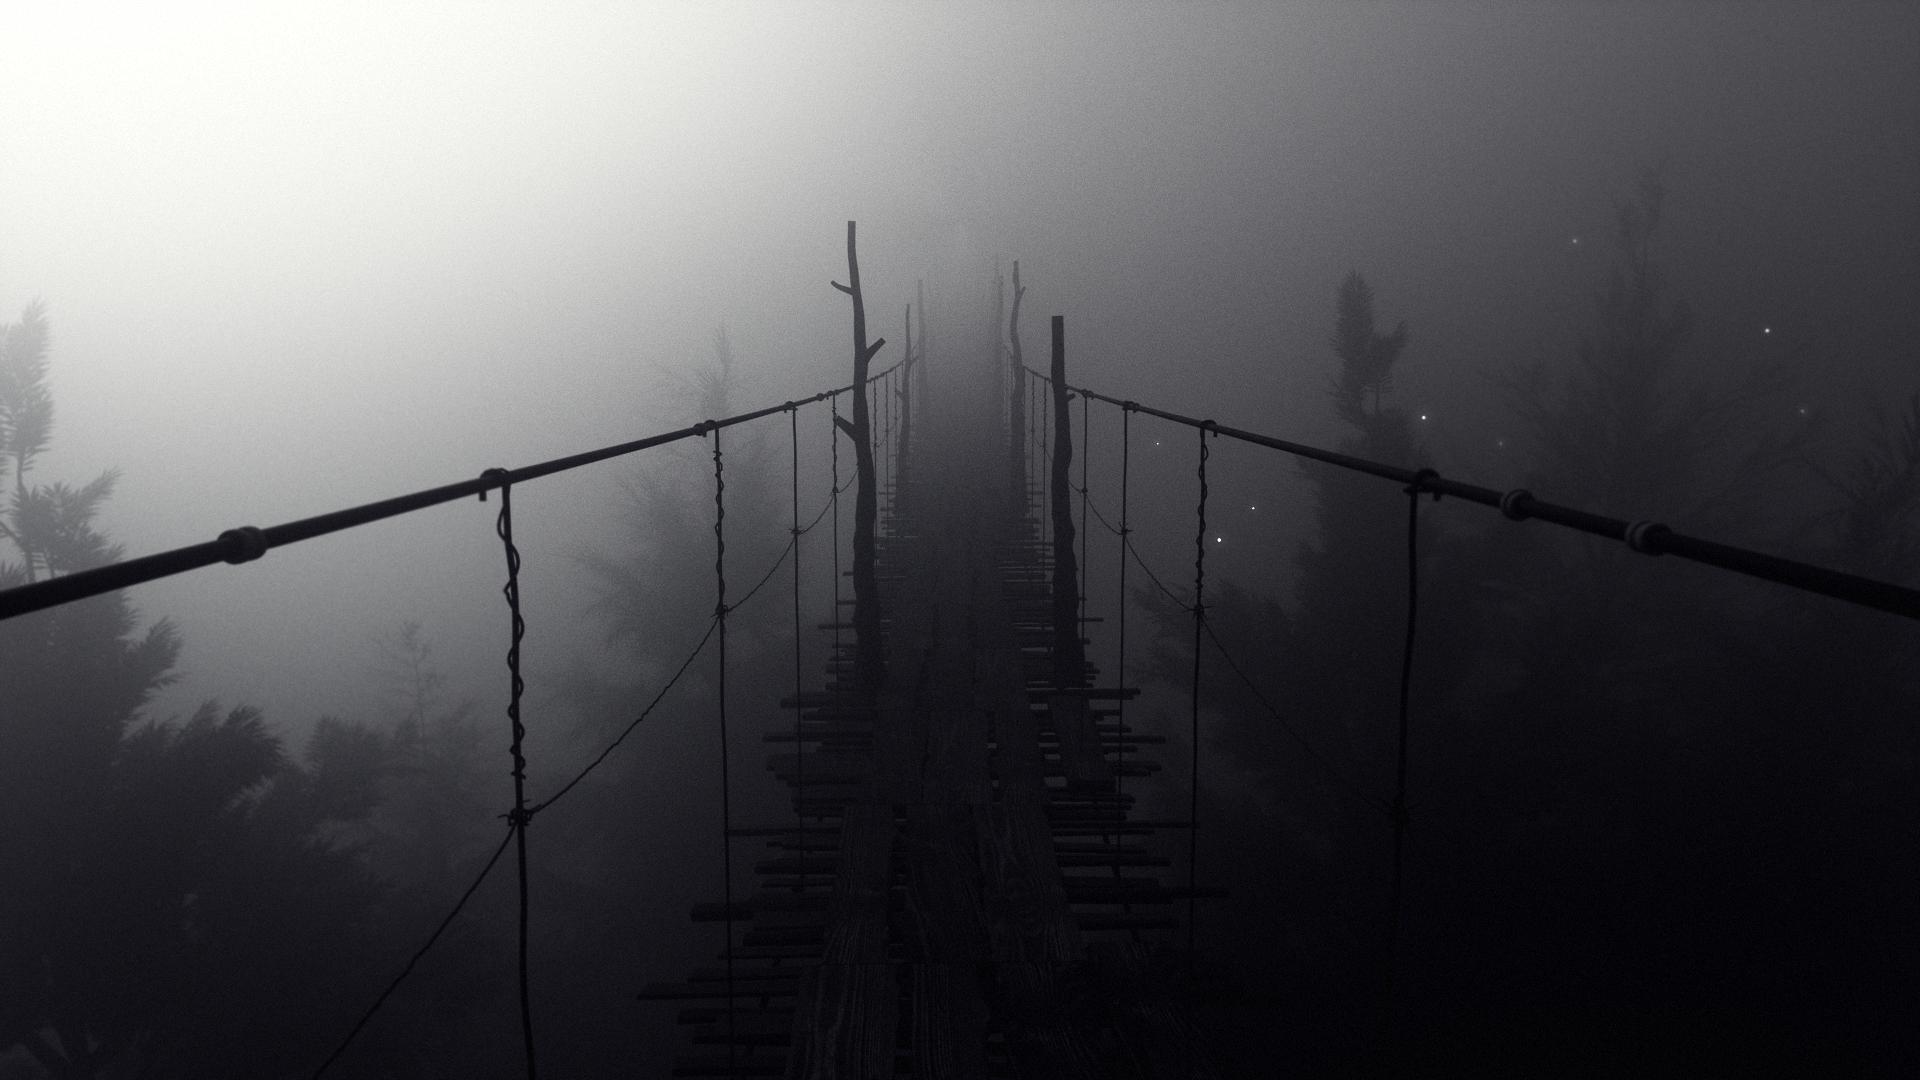 Volume Rendering with Octane Render for Cinema 4D - Foggy